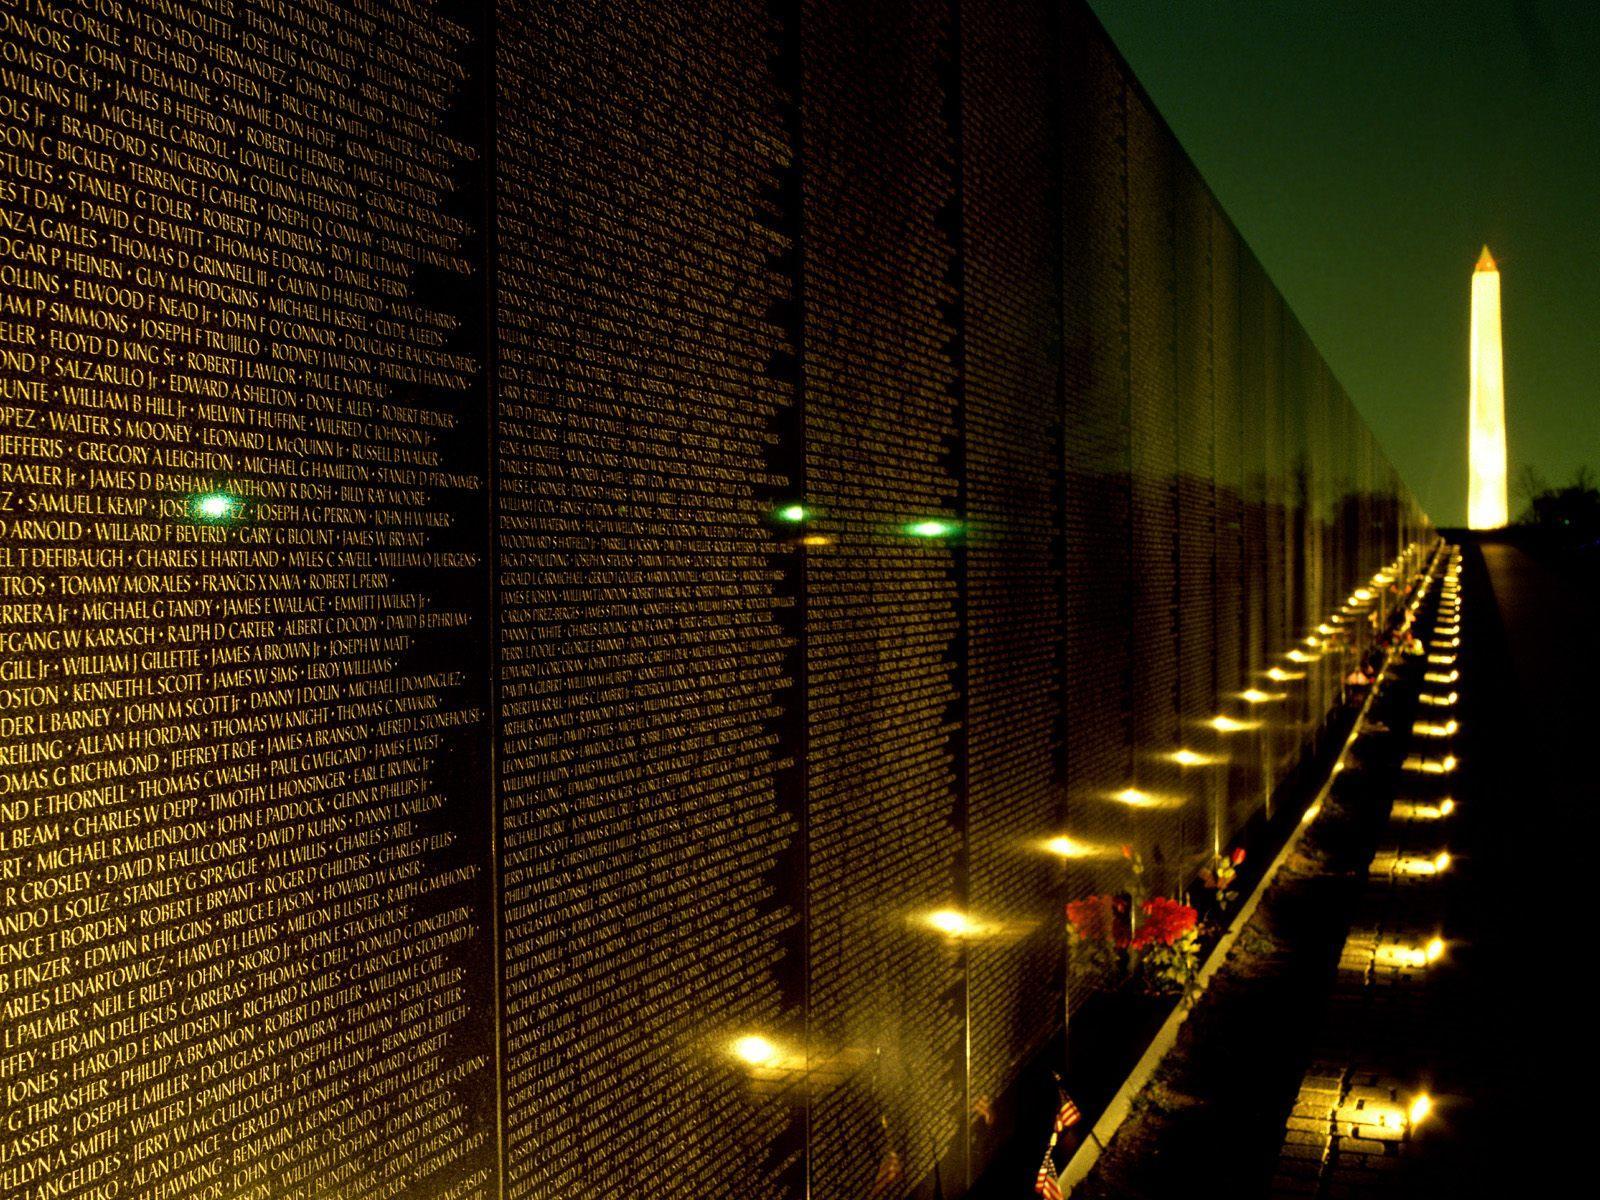 a lin essay vietnam veterans memorial 91 121 113 106 a lin essay vietnam veterans memorial